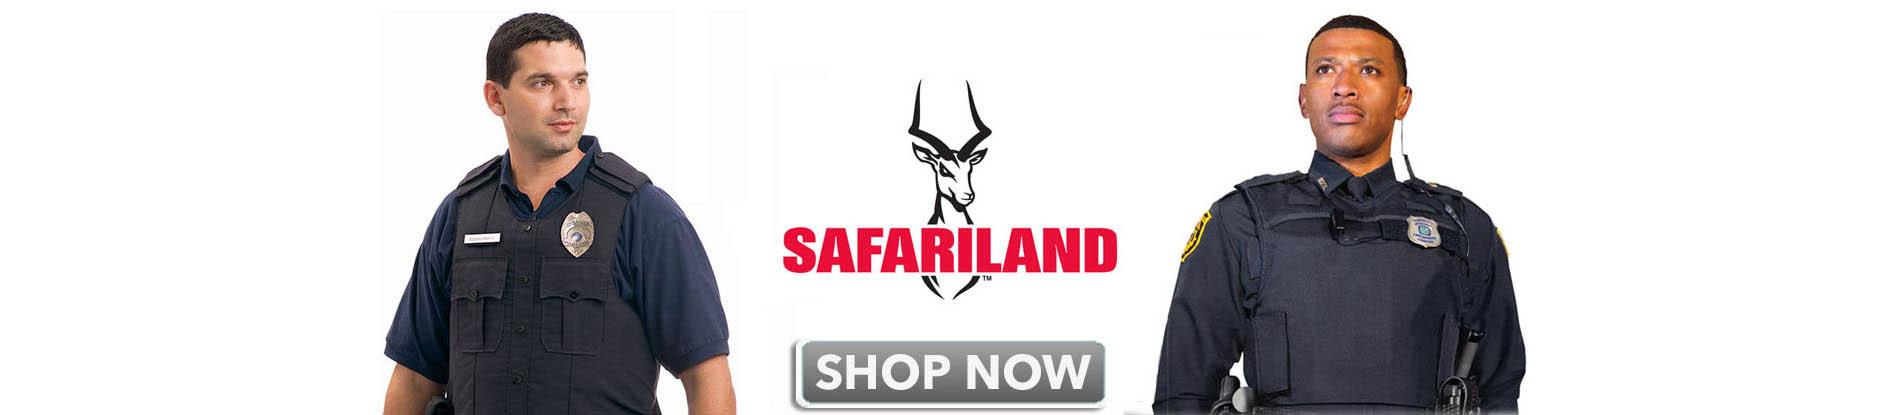 Safariland Canada